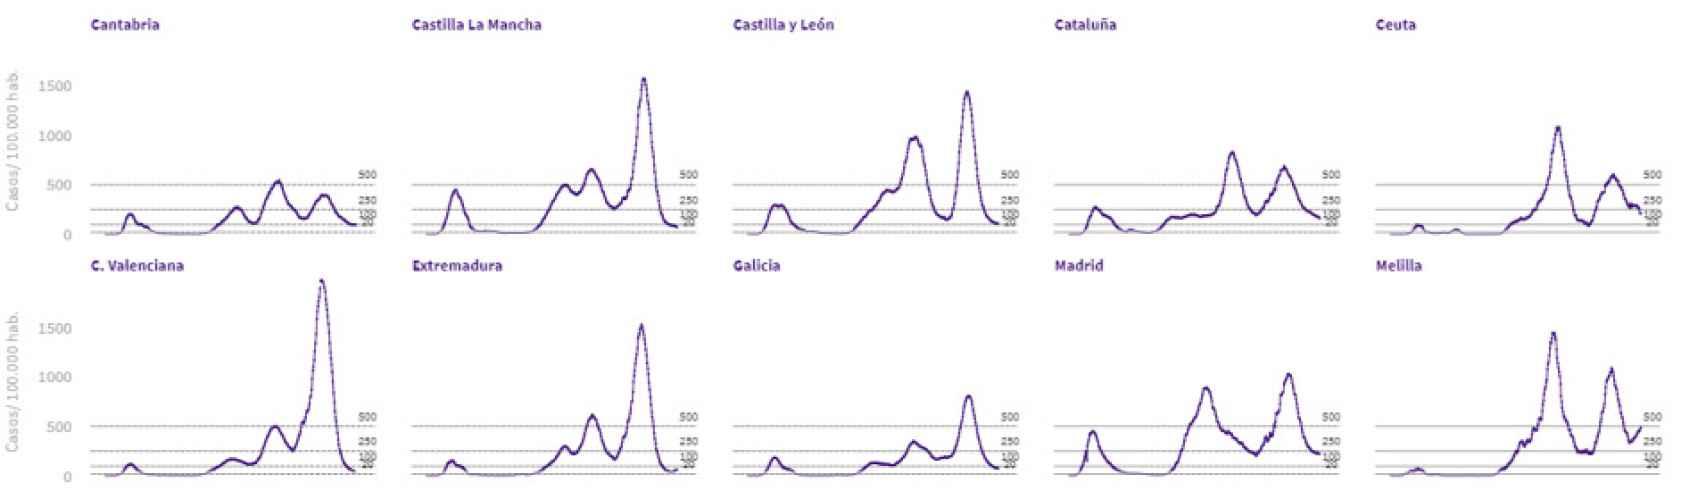 Comparativa curvas distintas regiones.